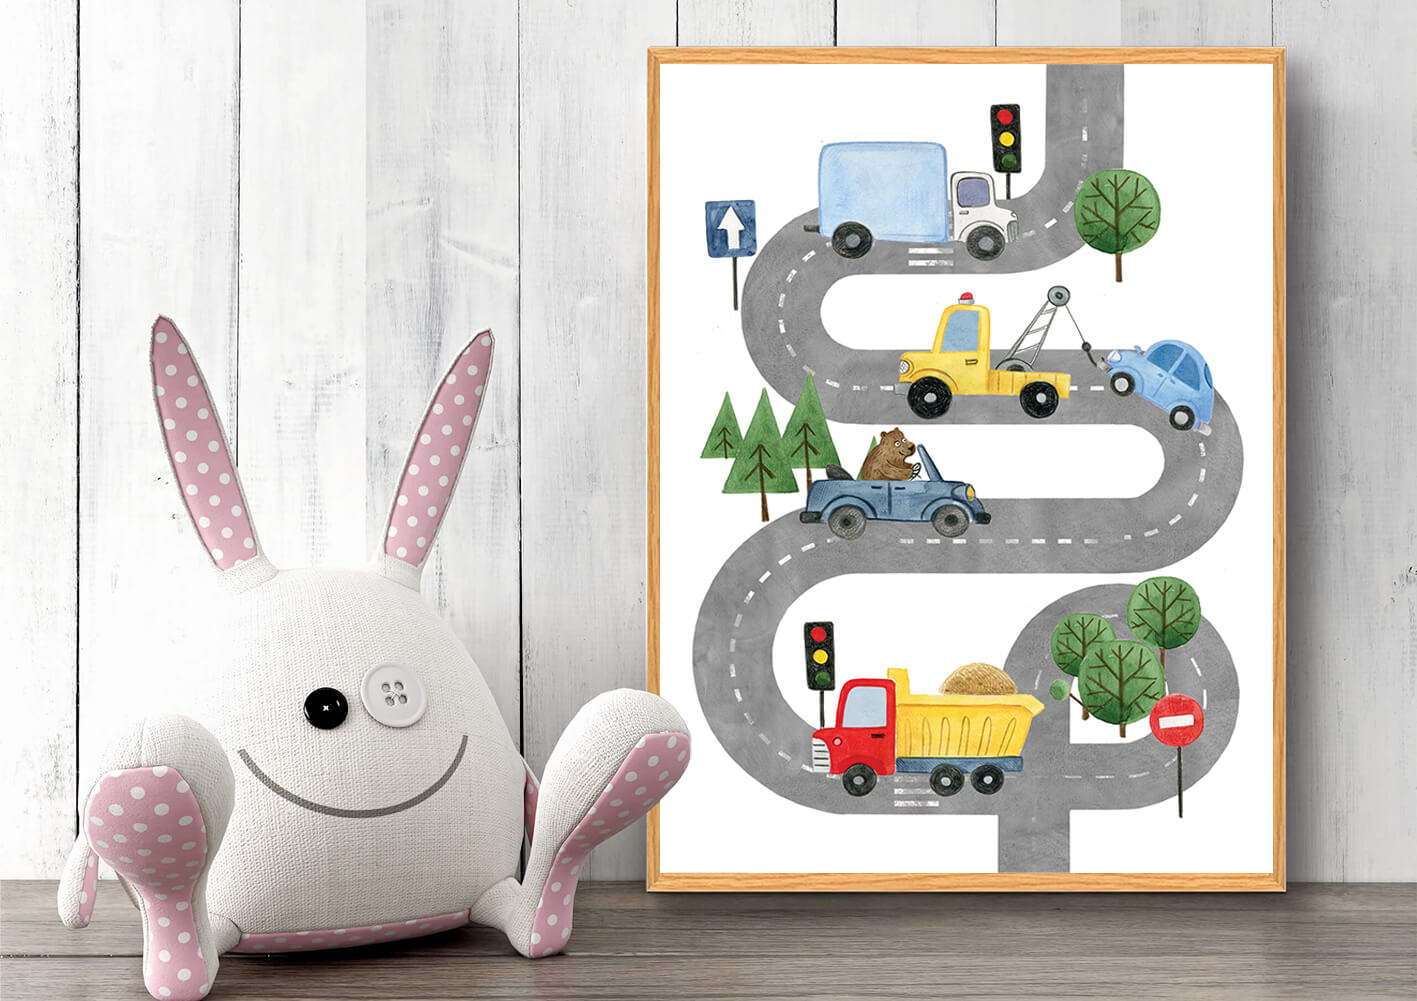 Bilplakat-veje-dyr-2